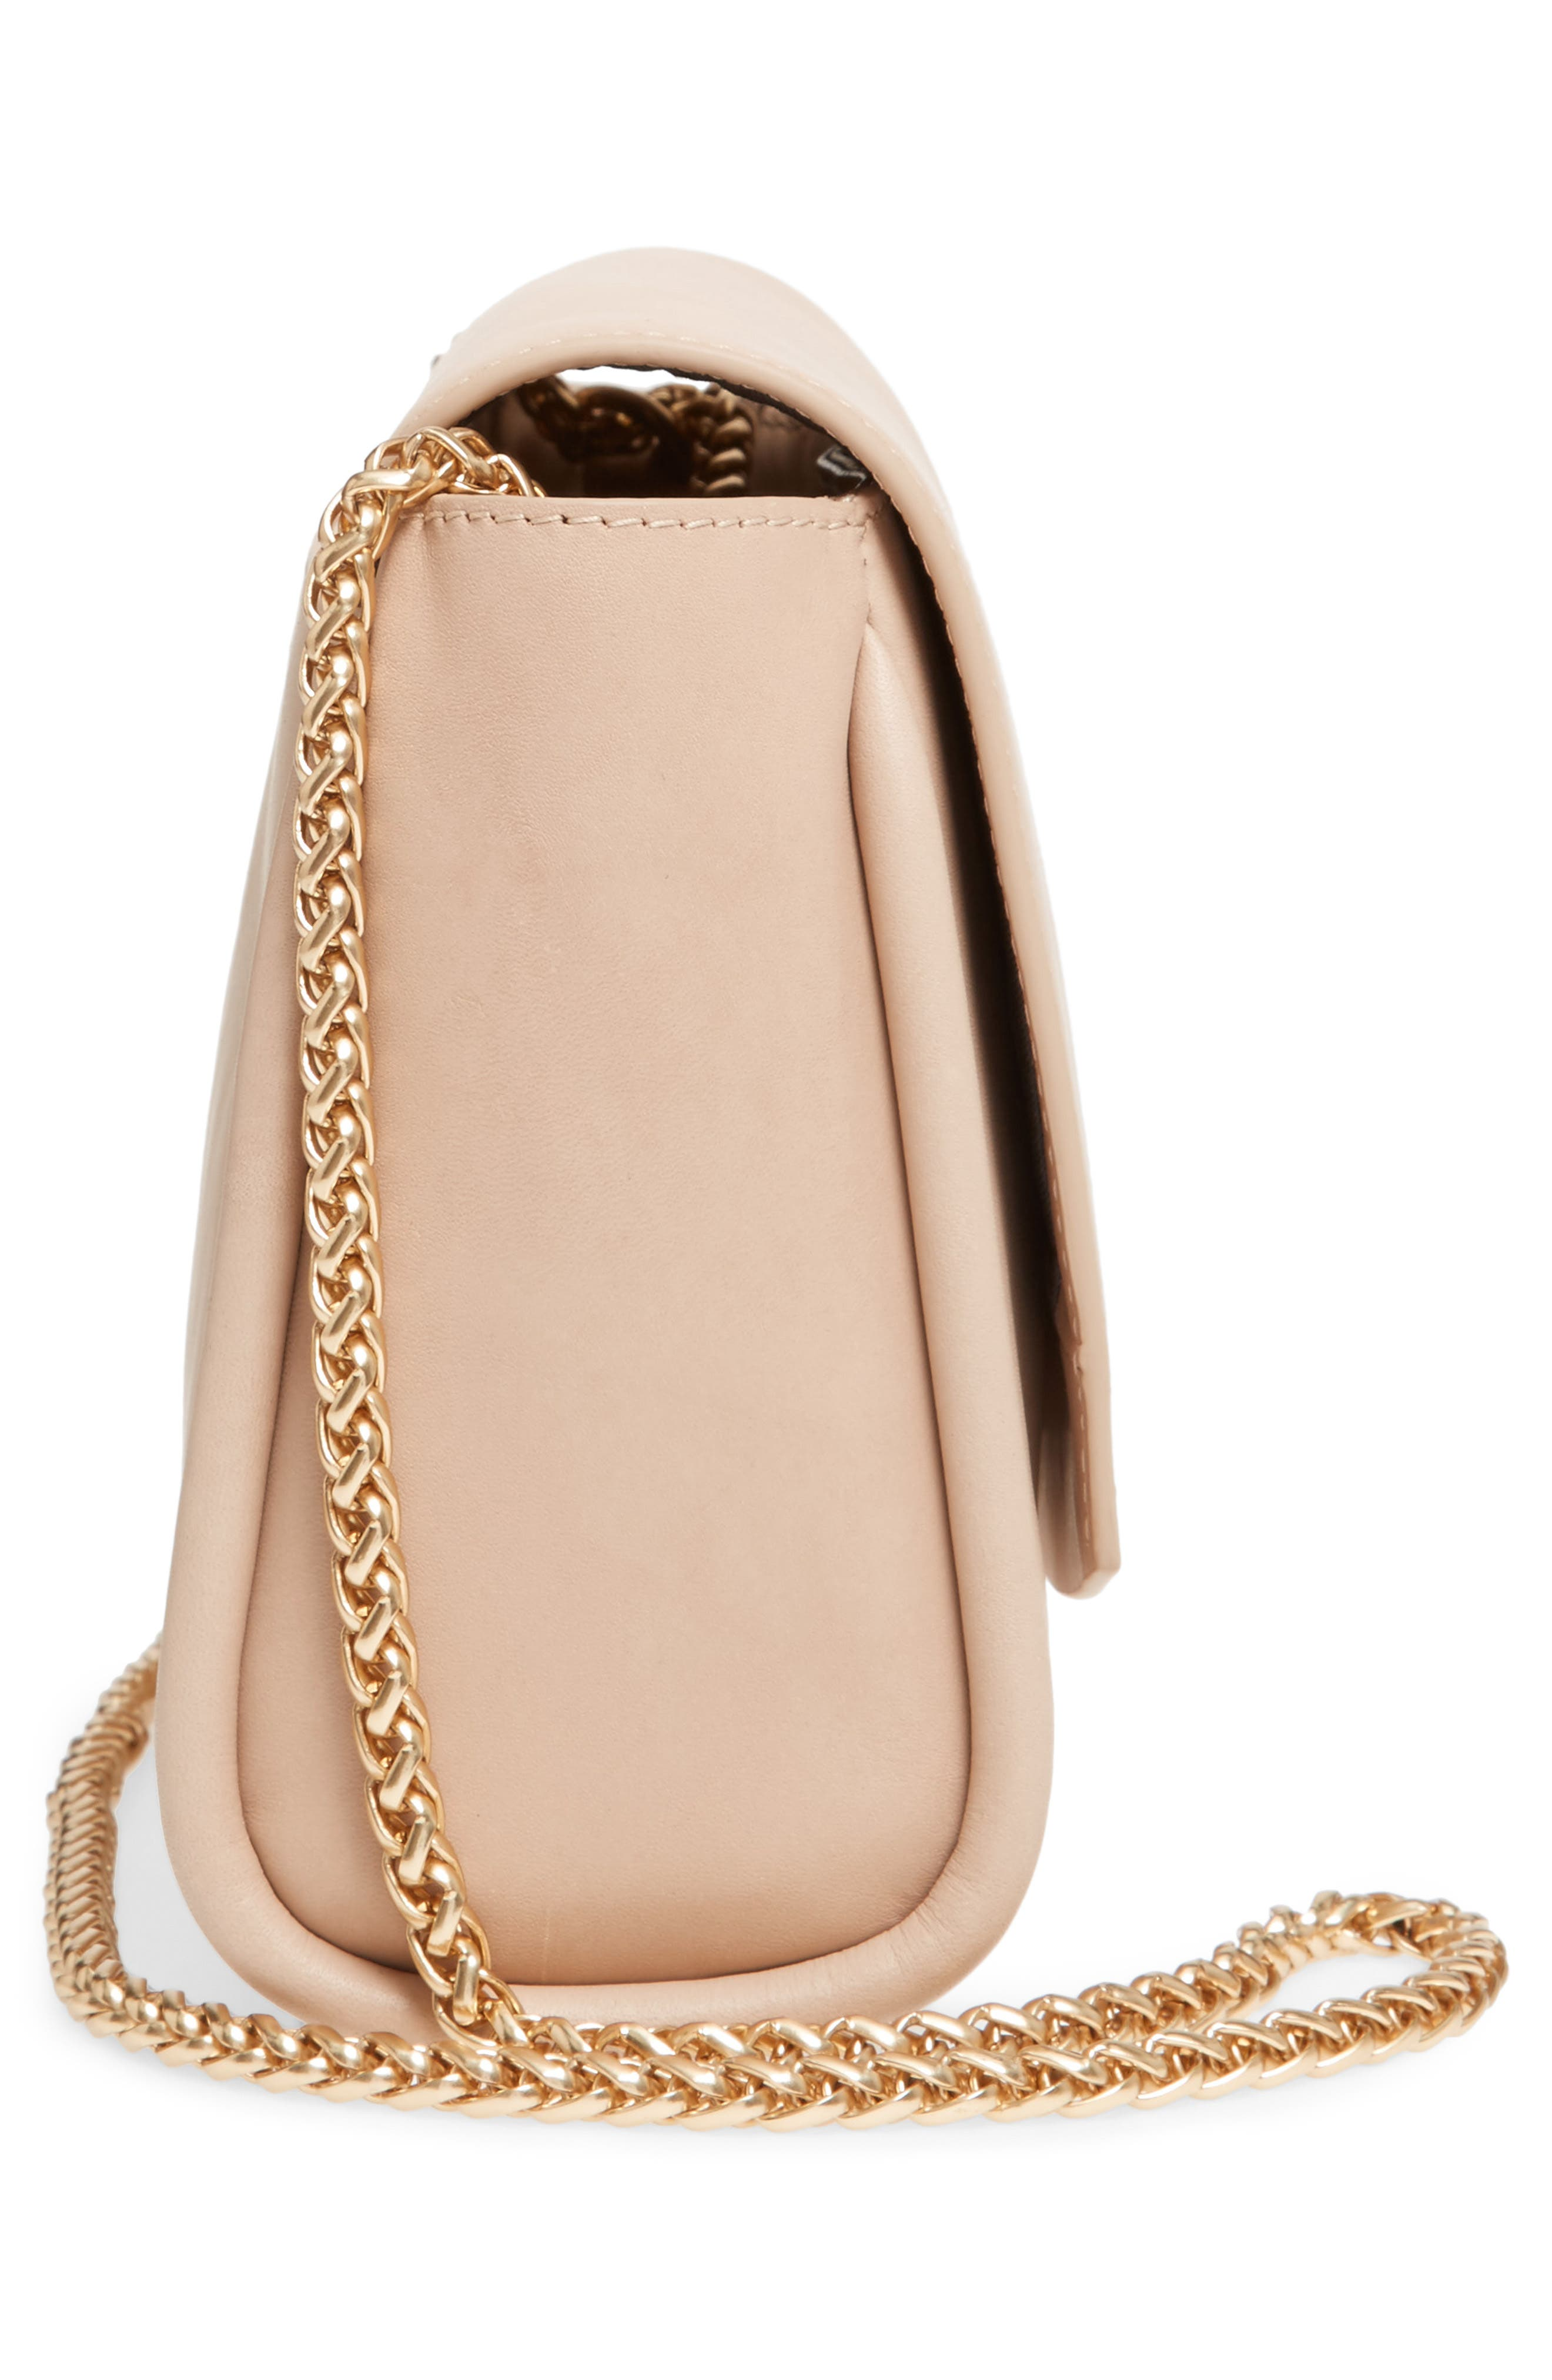 Sylvi Calfskin Leather Crossbody Bag,                             Alternate thumbnail 4, color,                             Beige